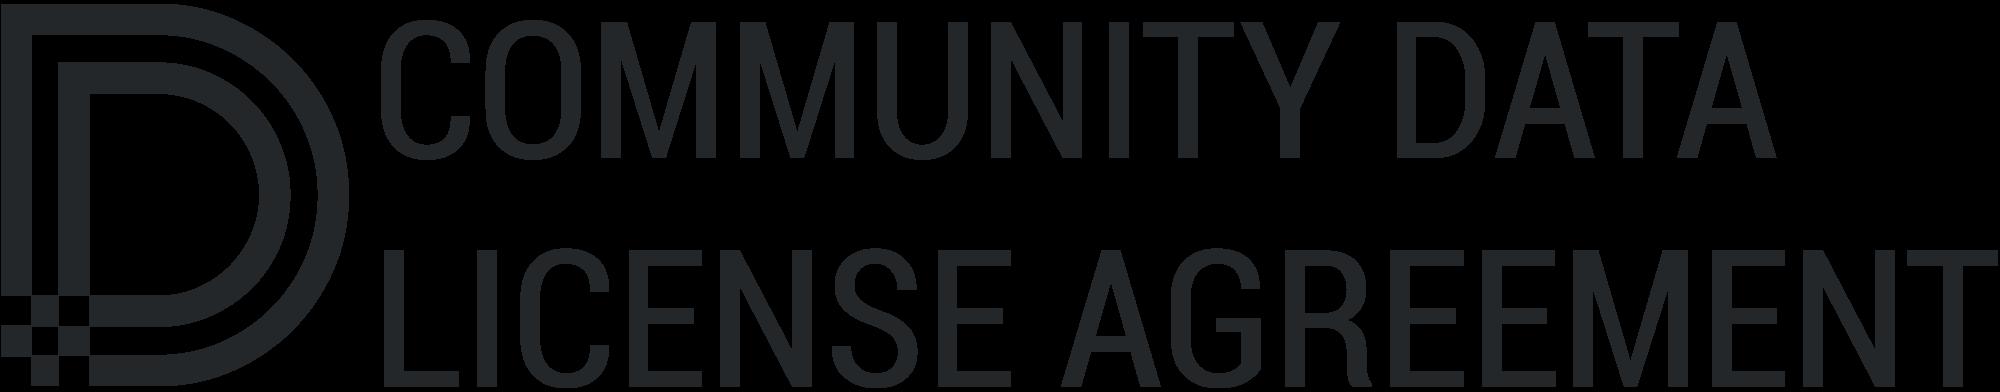 Community Data License Agreement Sharing Version 10 Cdla